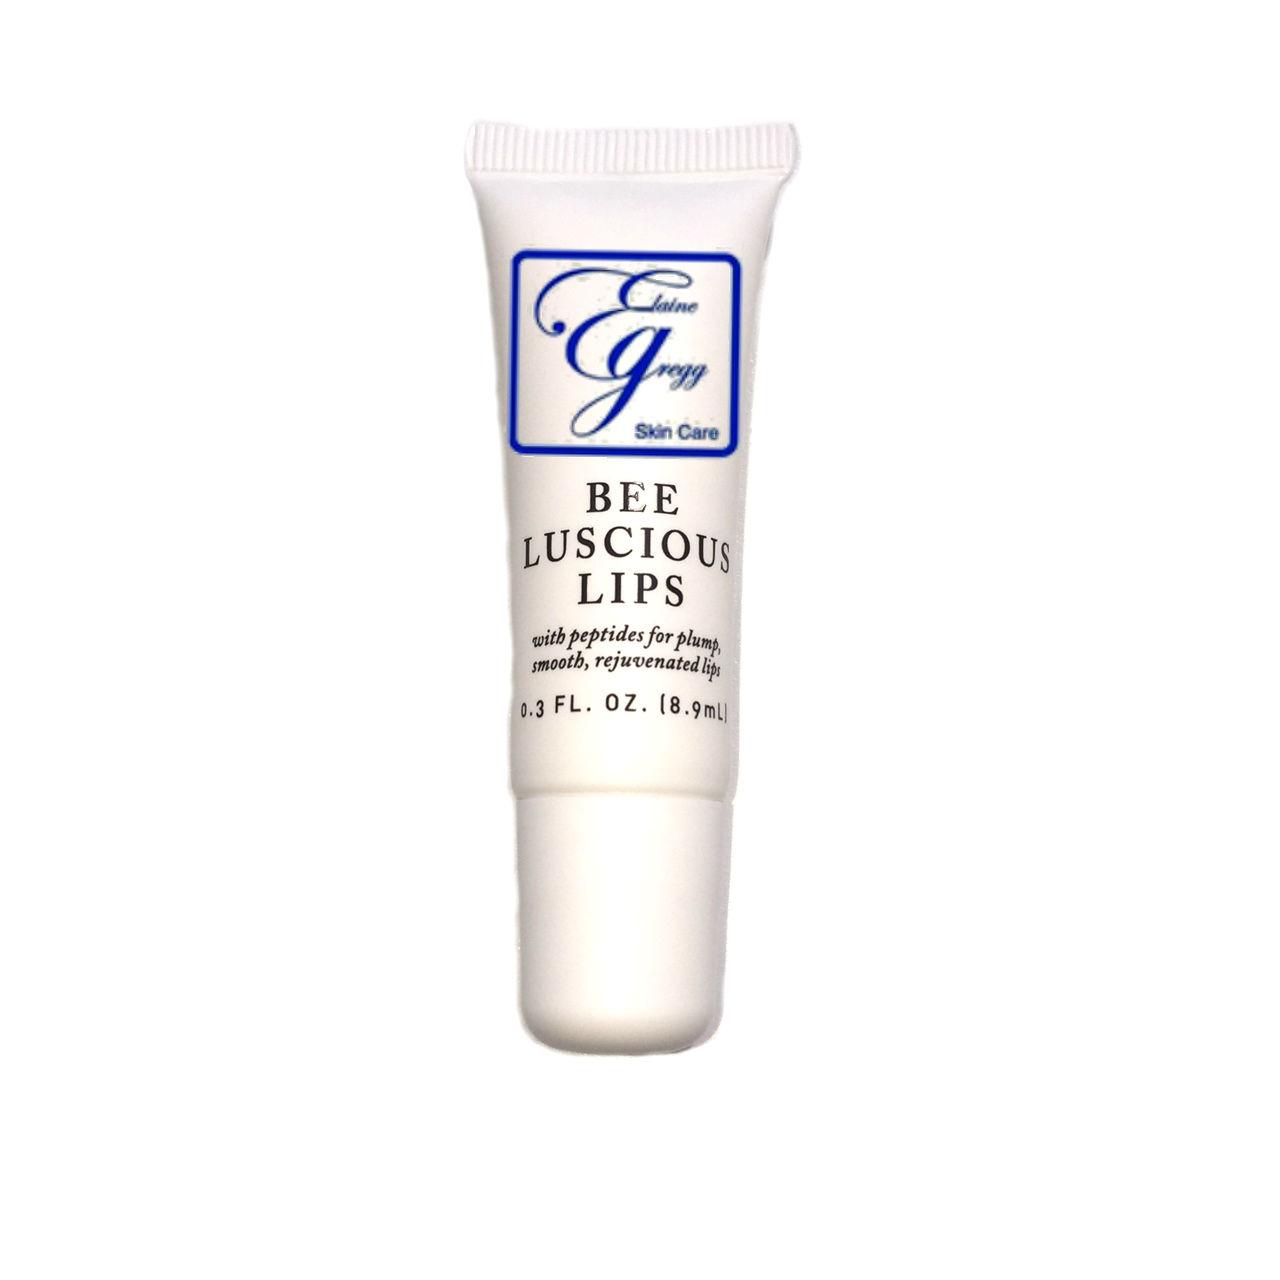 Elaine Gregg Bee Luscious Lips